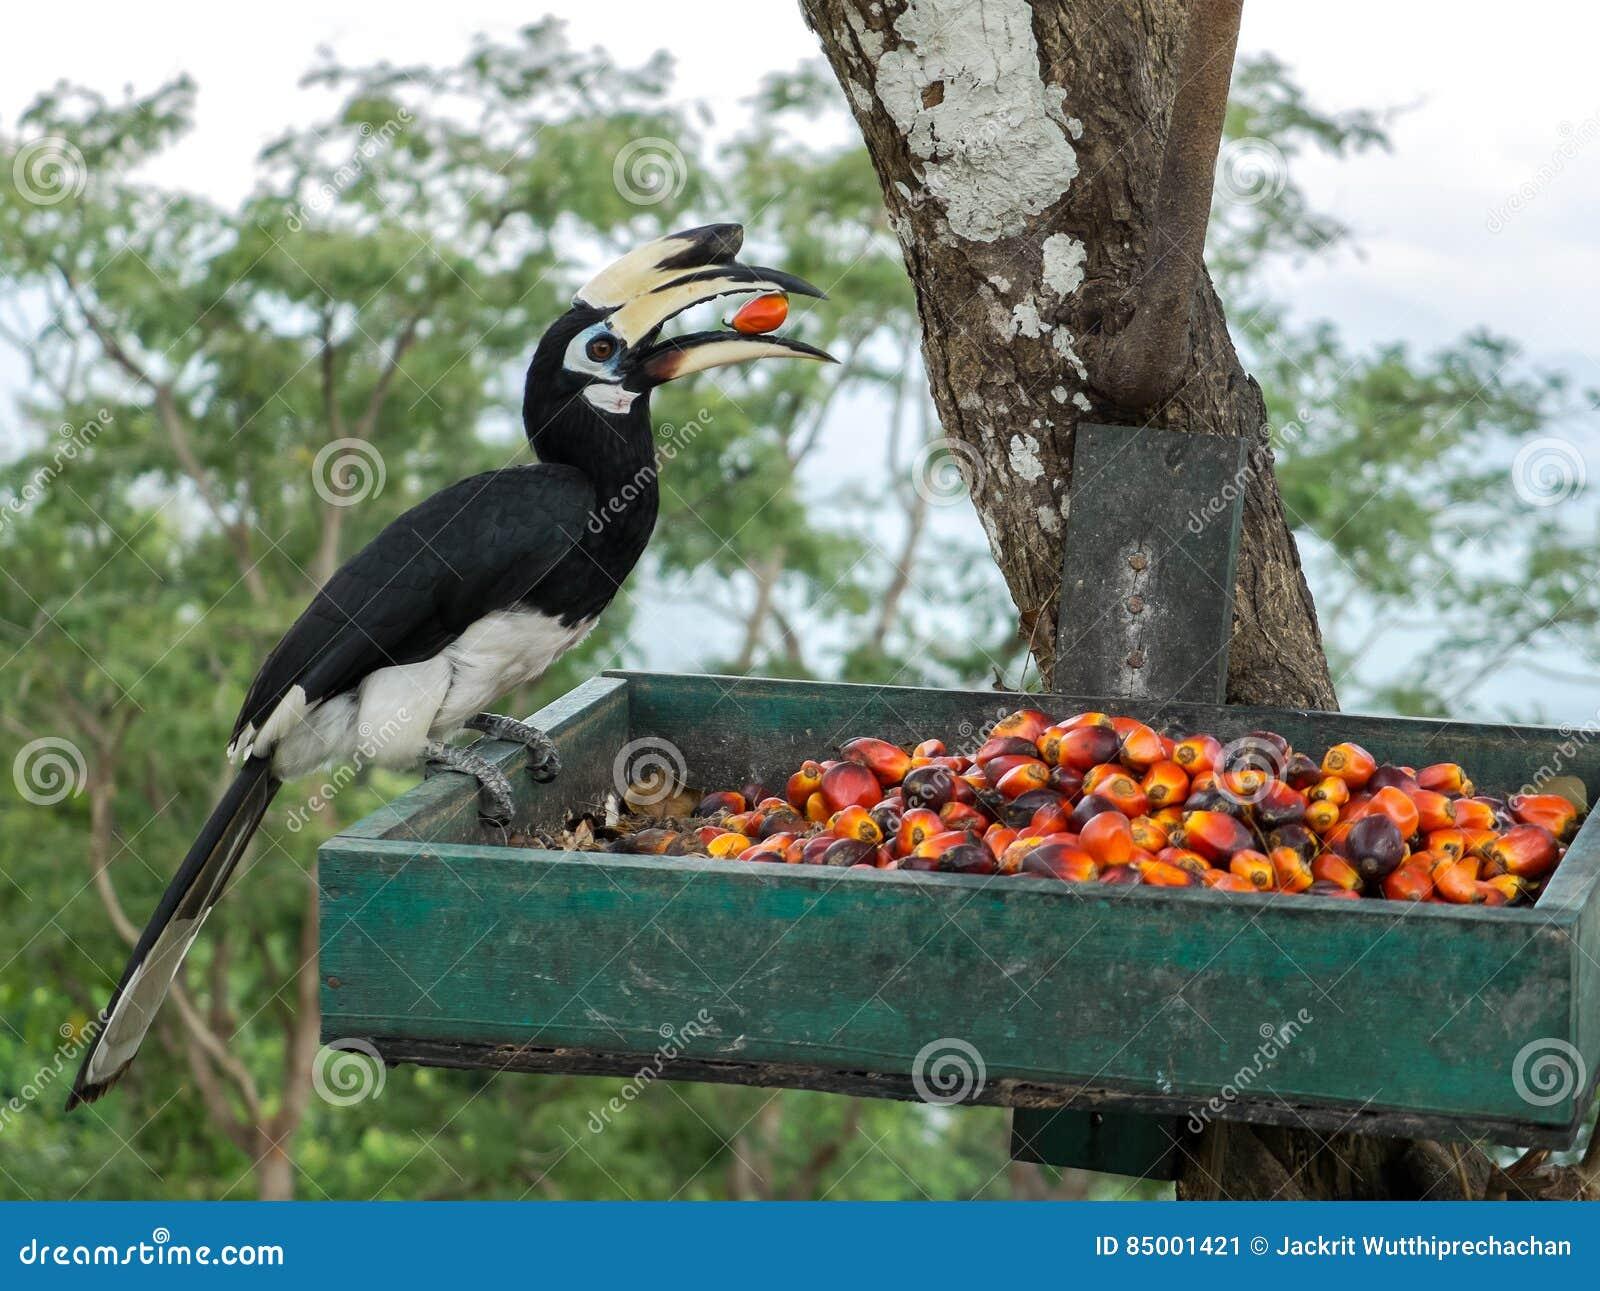 Close up portrait of Single Wild Oriental pied hornbill Bird Anthracoceros albirostris eating red wild fruits in Green Basket